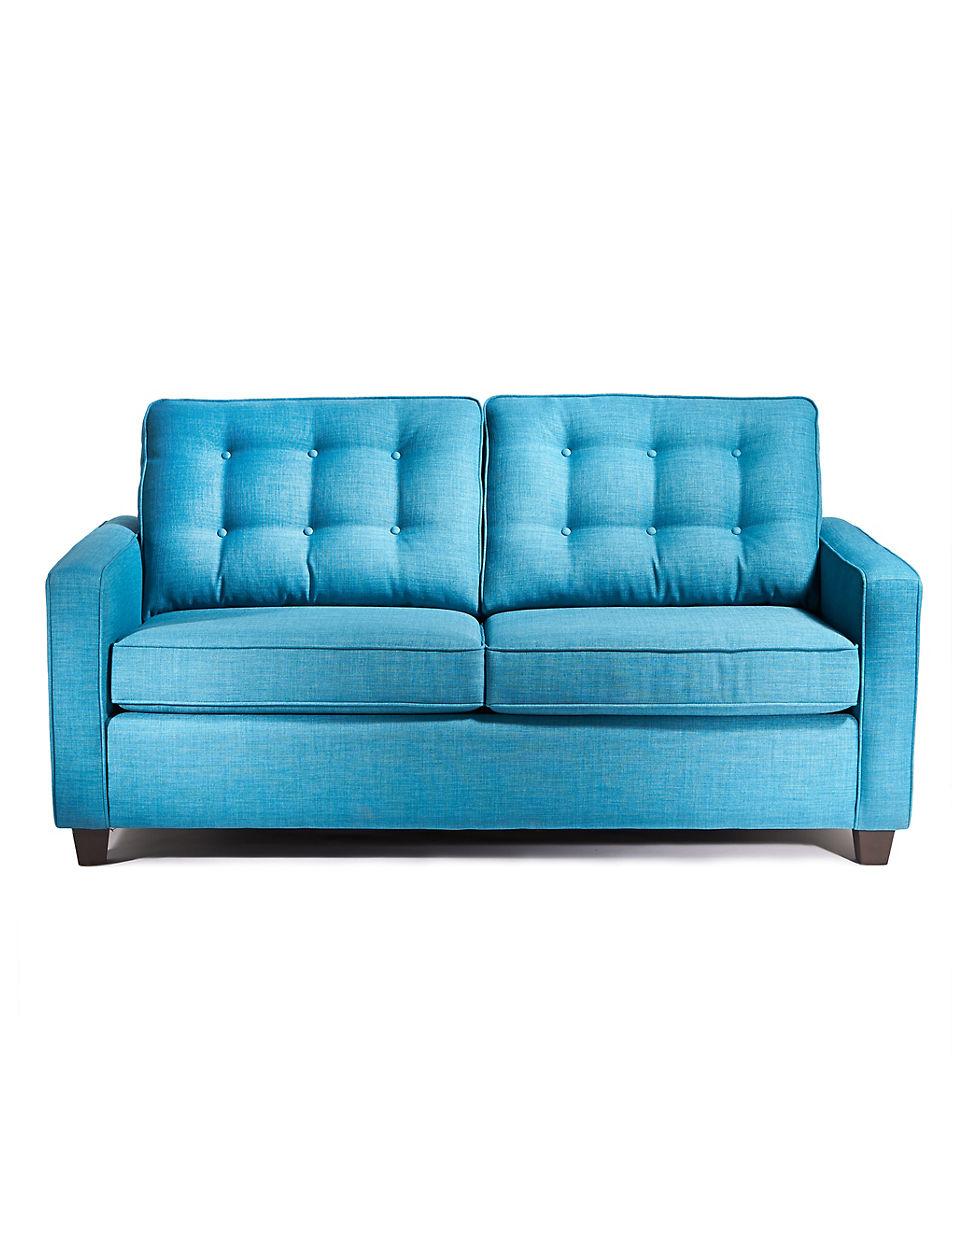 Sofa Beds Canada